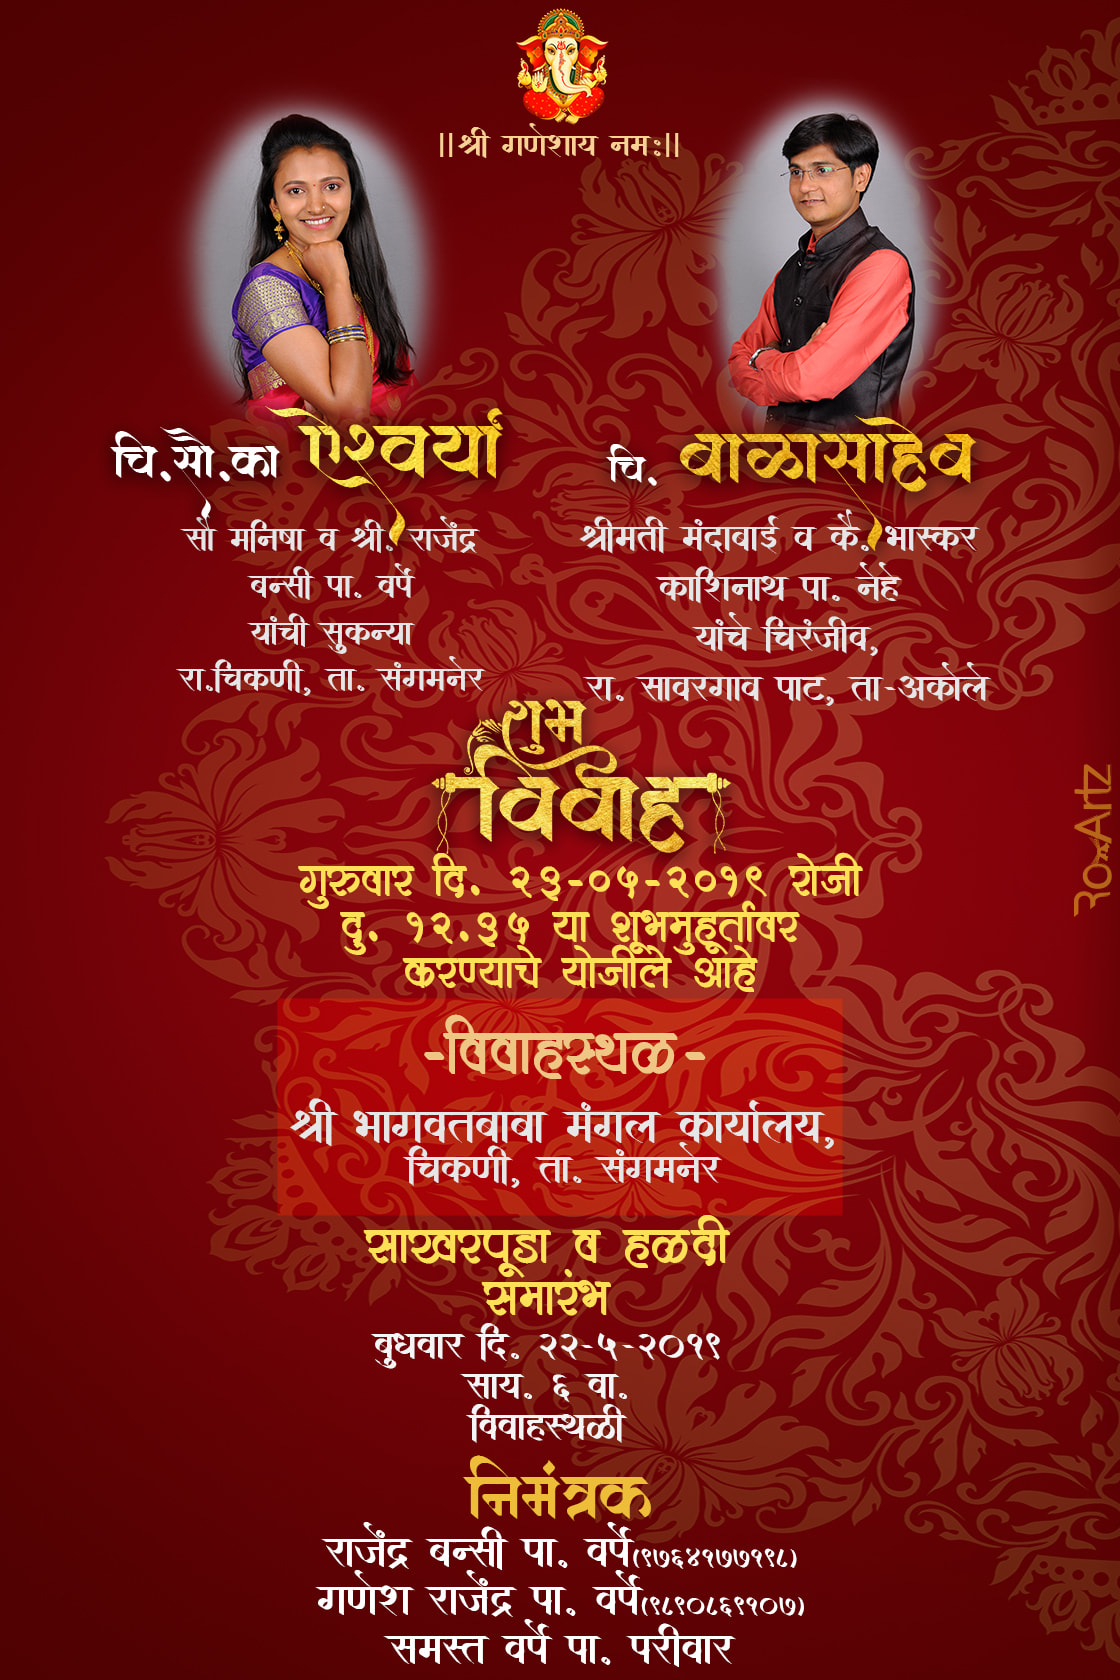 Design Indian Wedding Invitation Card By Roartz Fiverr